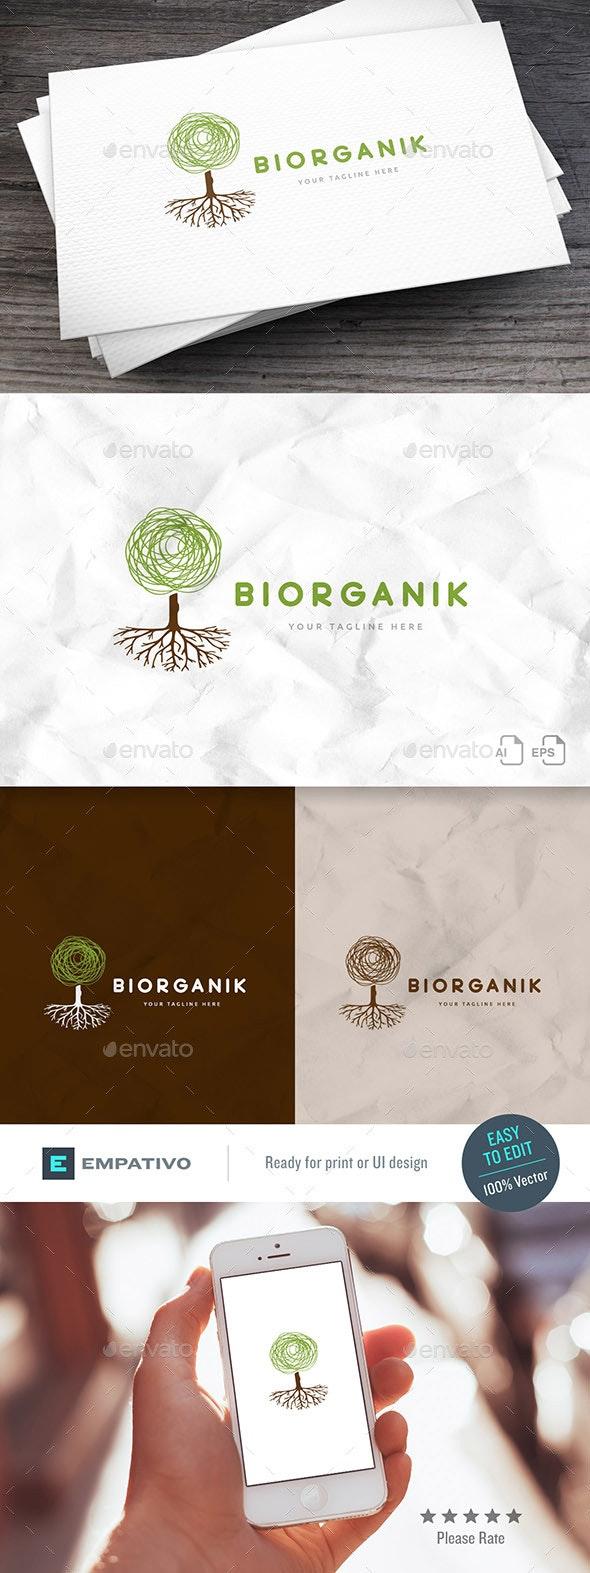 Biorganik Logo Template - Nature Logo Templates